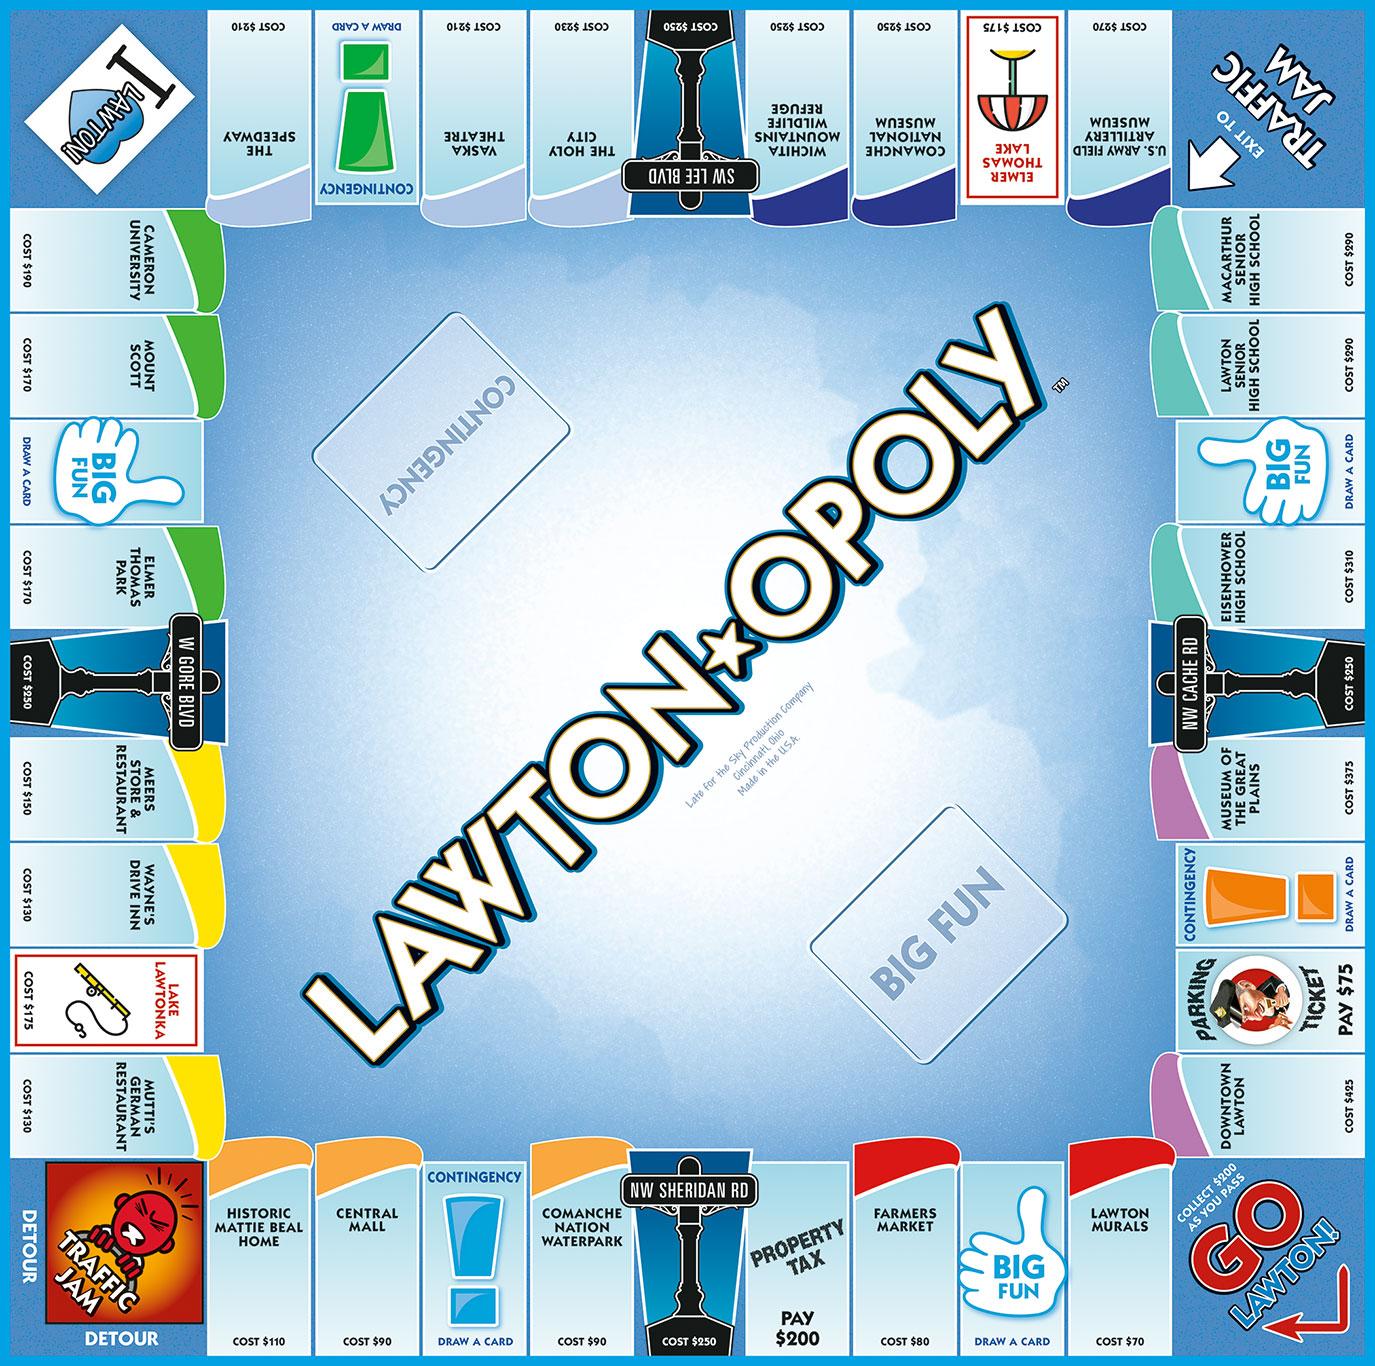 LAWTON-OPOLY Board Game